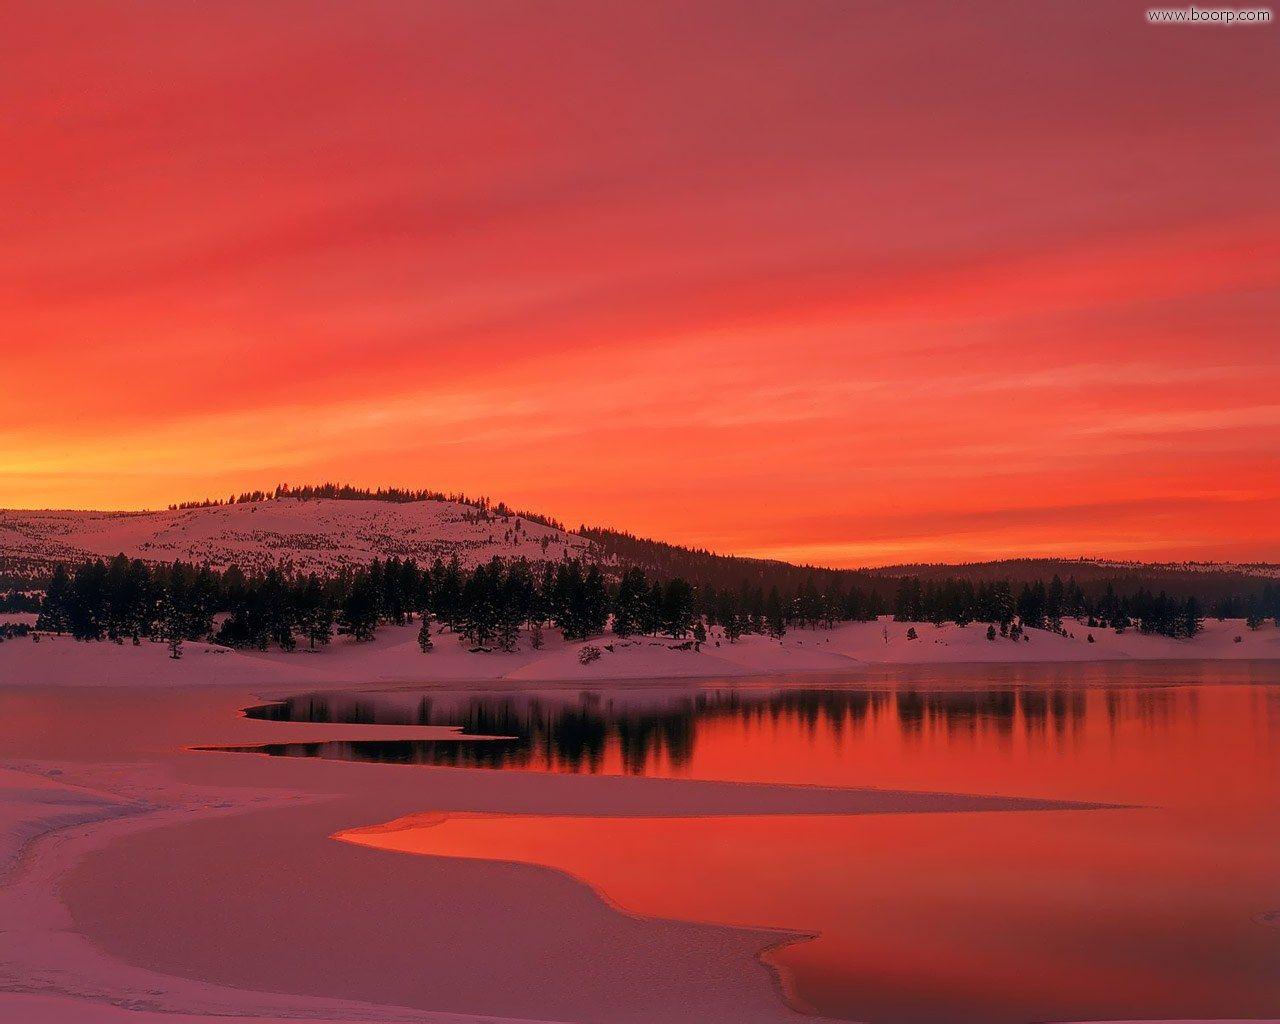 холмы озеро небо закат пейзаж  № 2743203 бесплатно